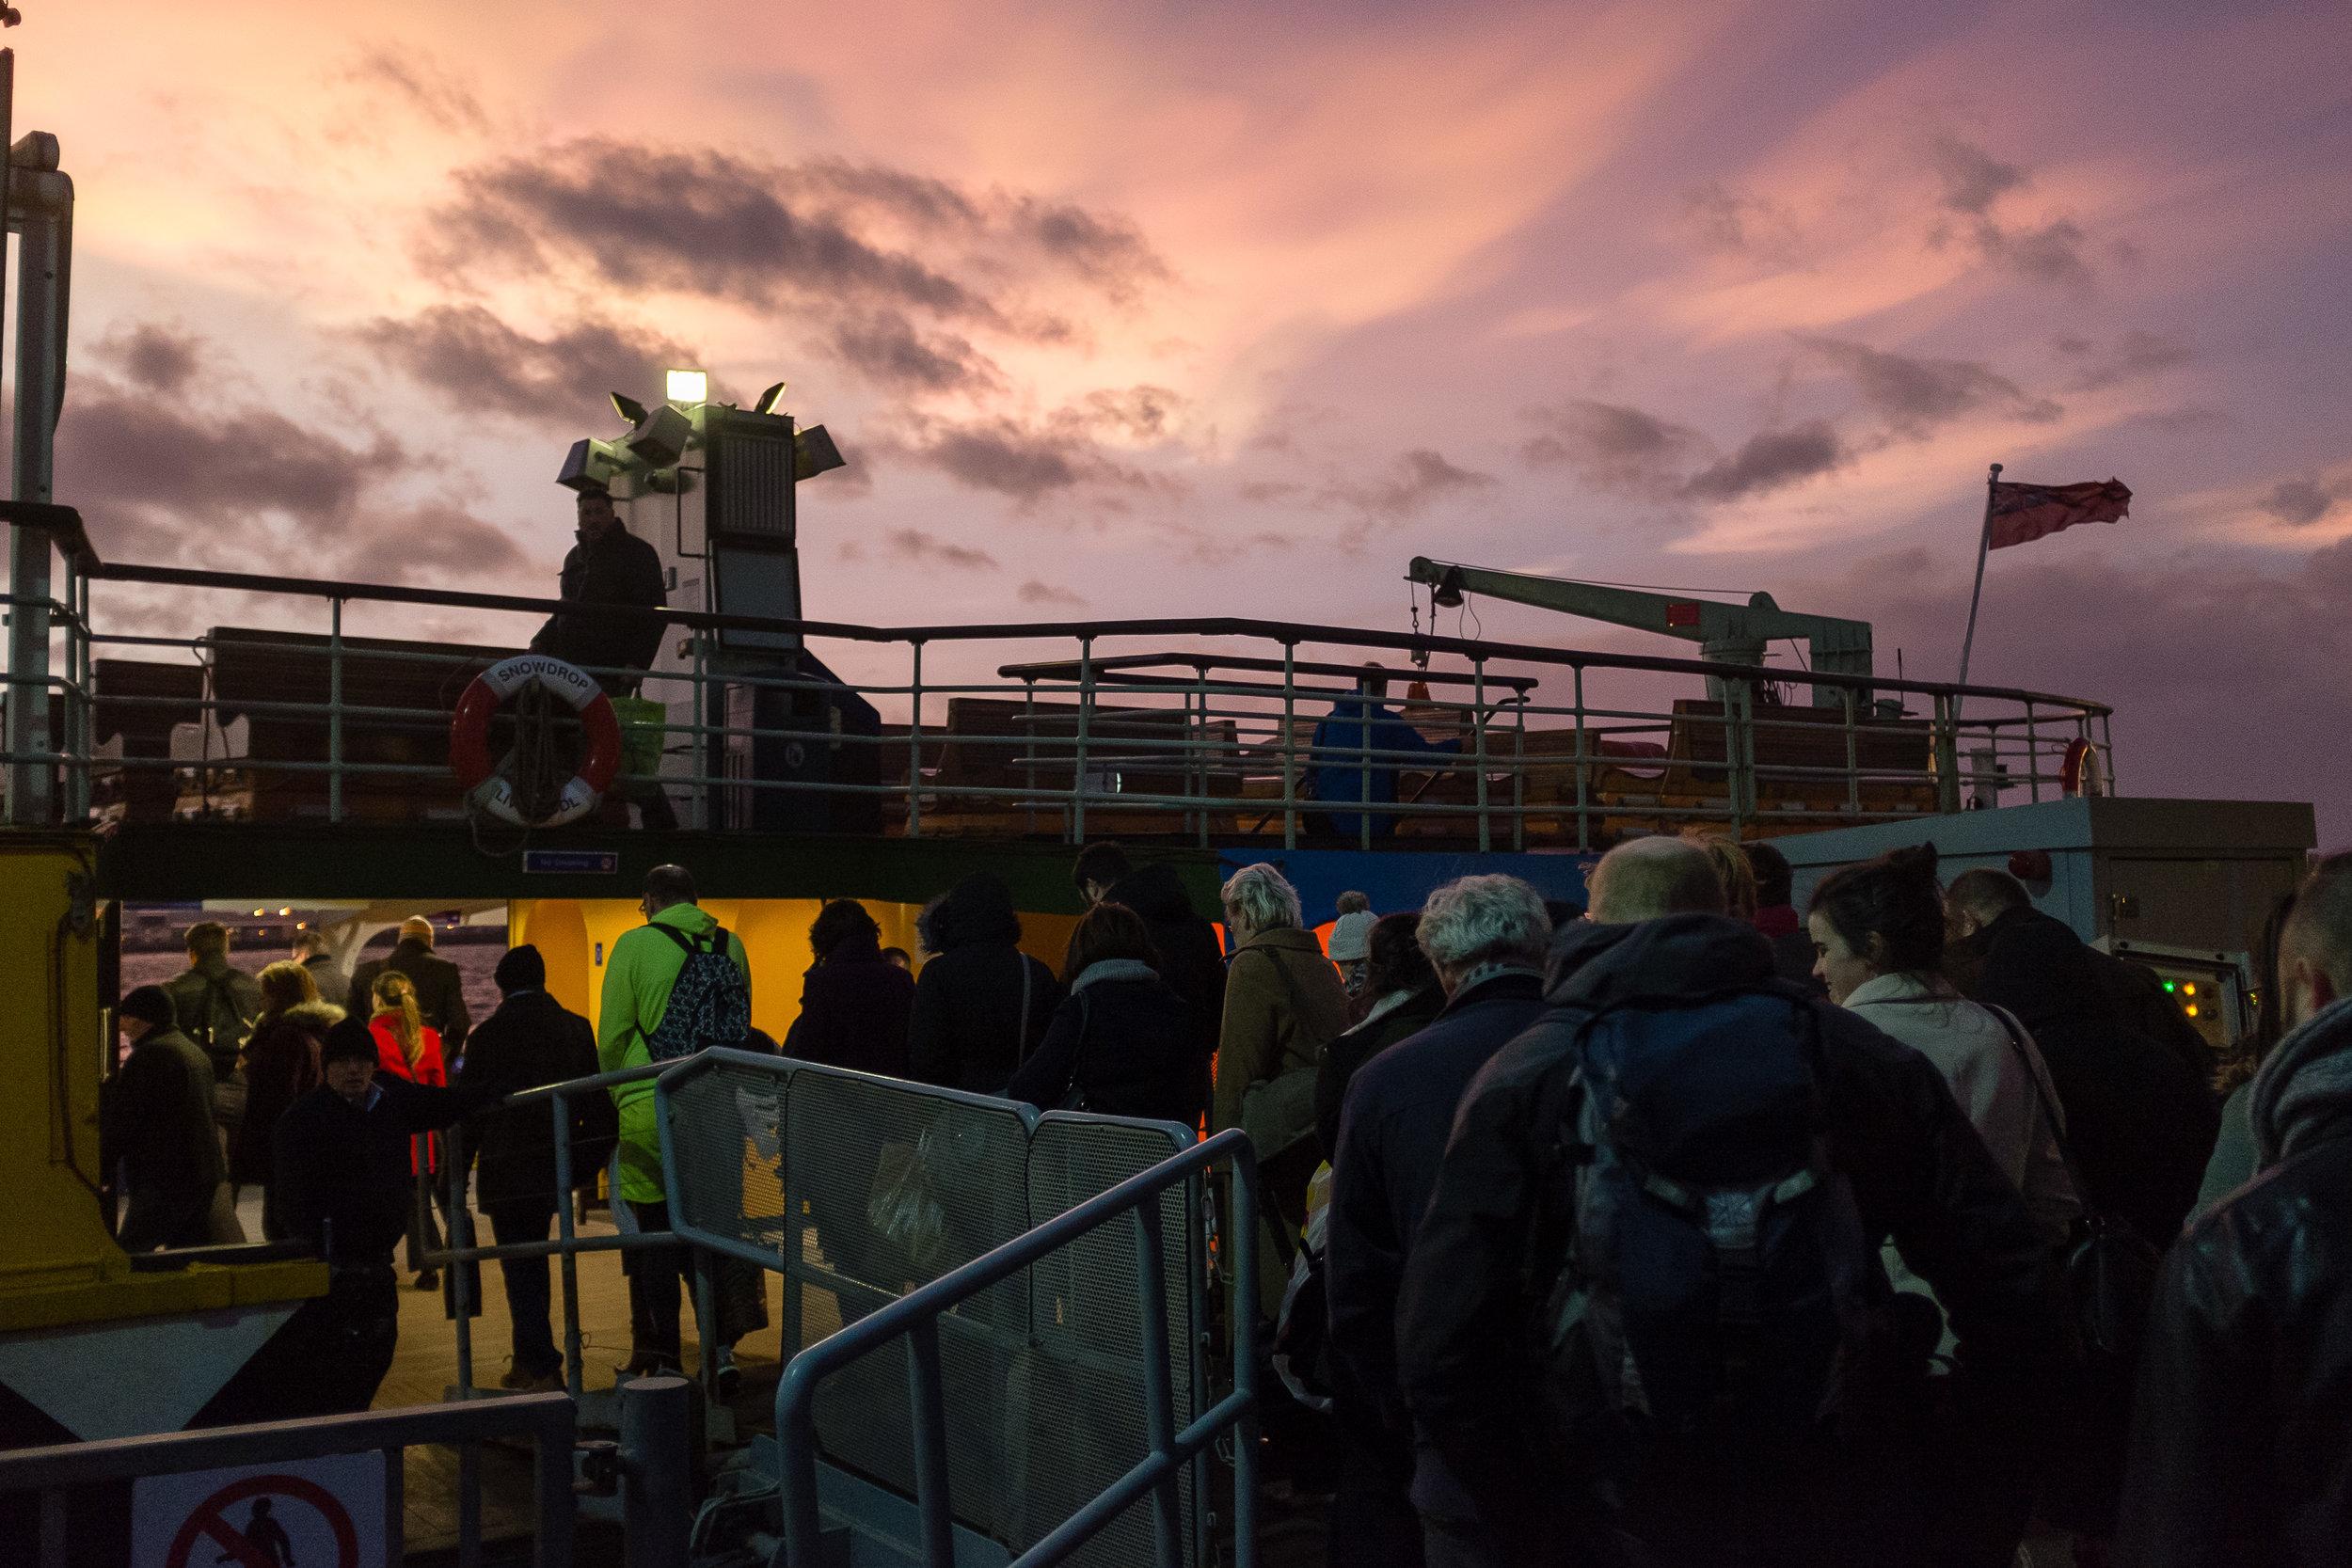 Ferry-1517-pete-carr.jpg